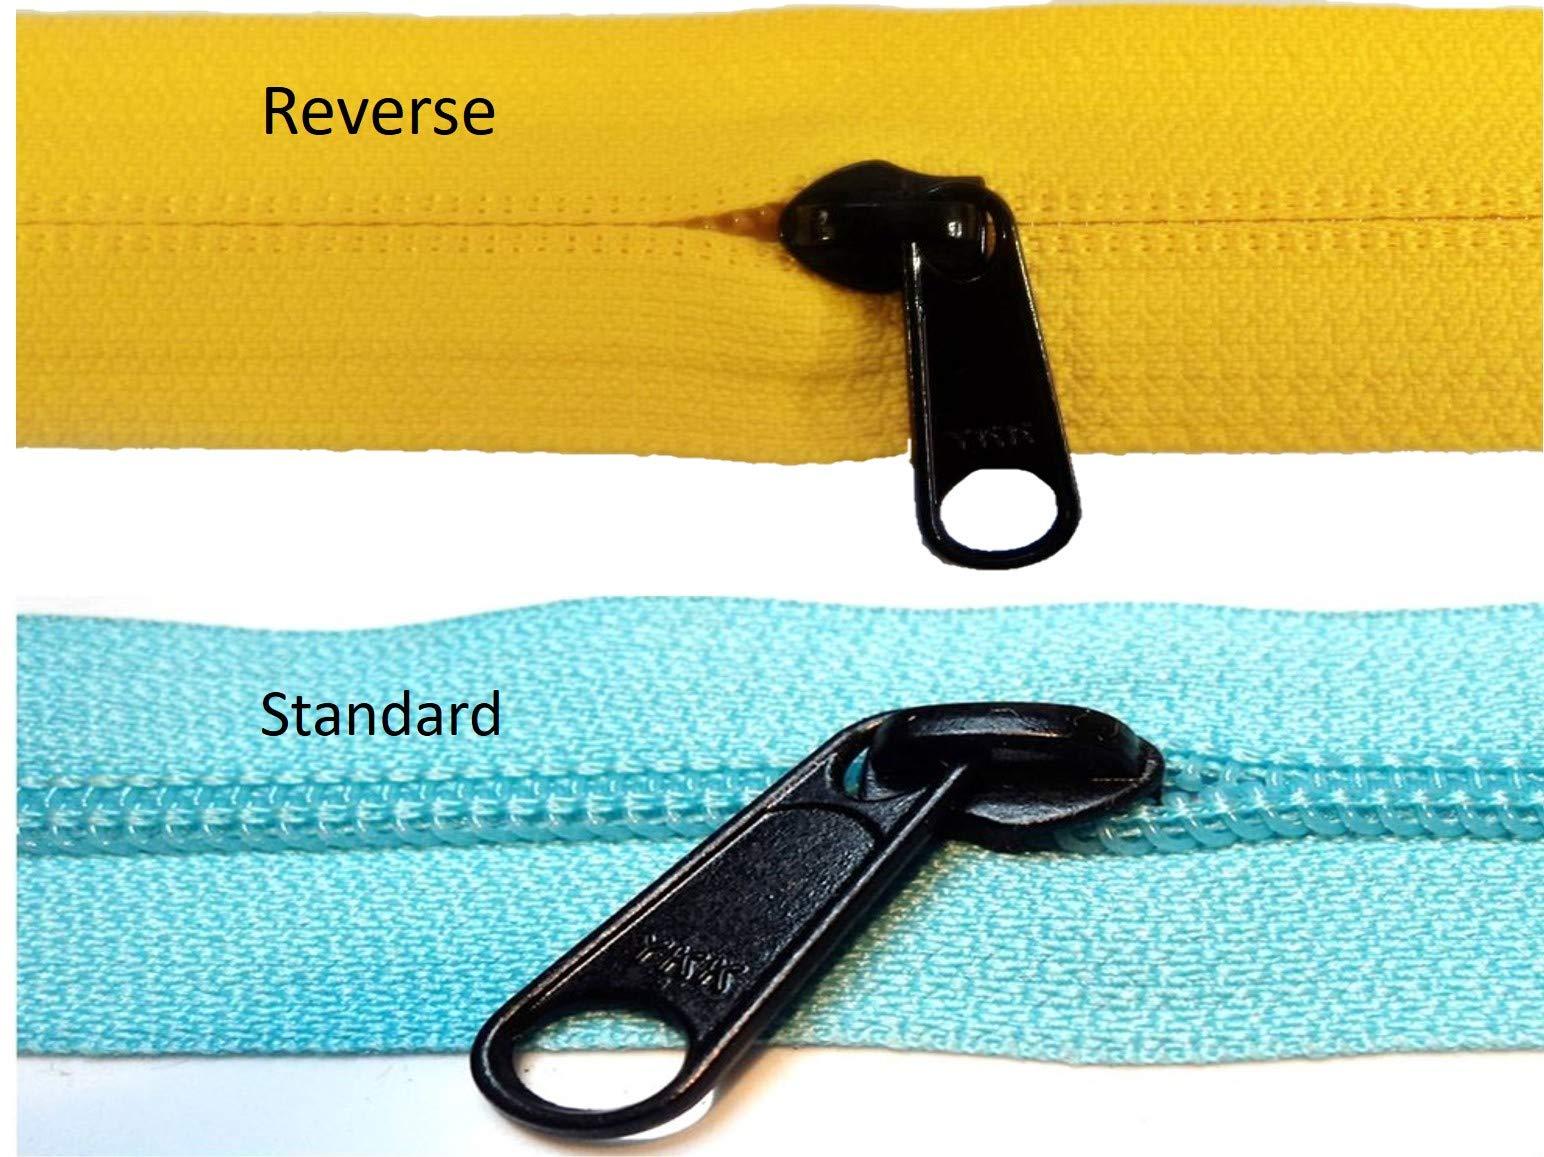 Northwest Contract Sewing Authorized Distributor of YKK - YKK #5 Coil Reverse Zipper Slider (250) by YKK